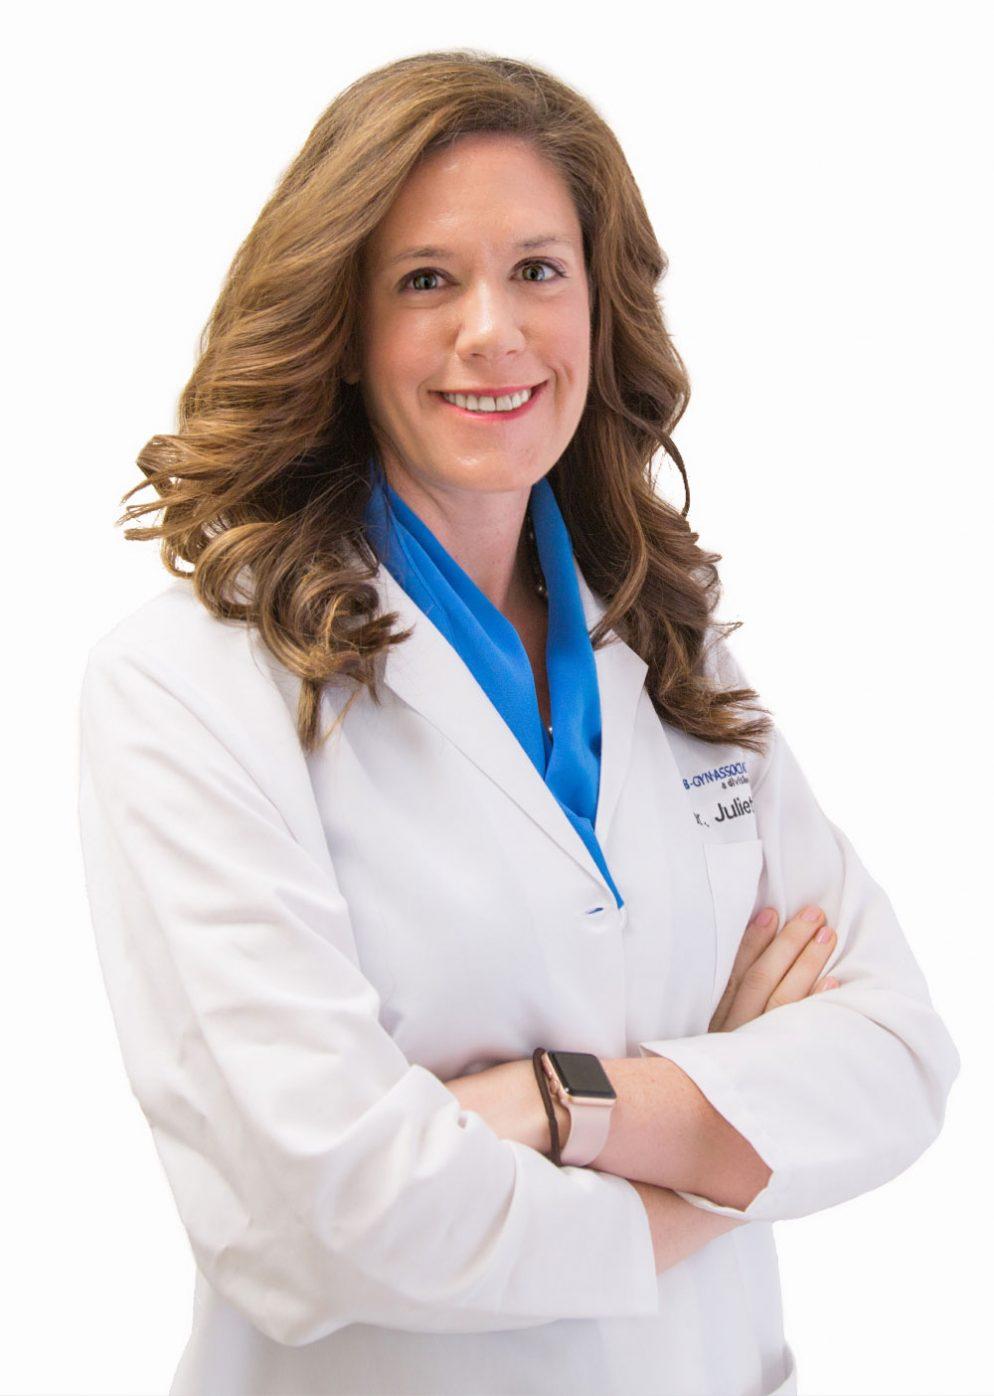 Juliette Prust, MD